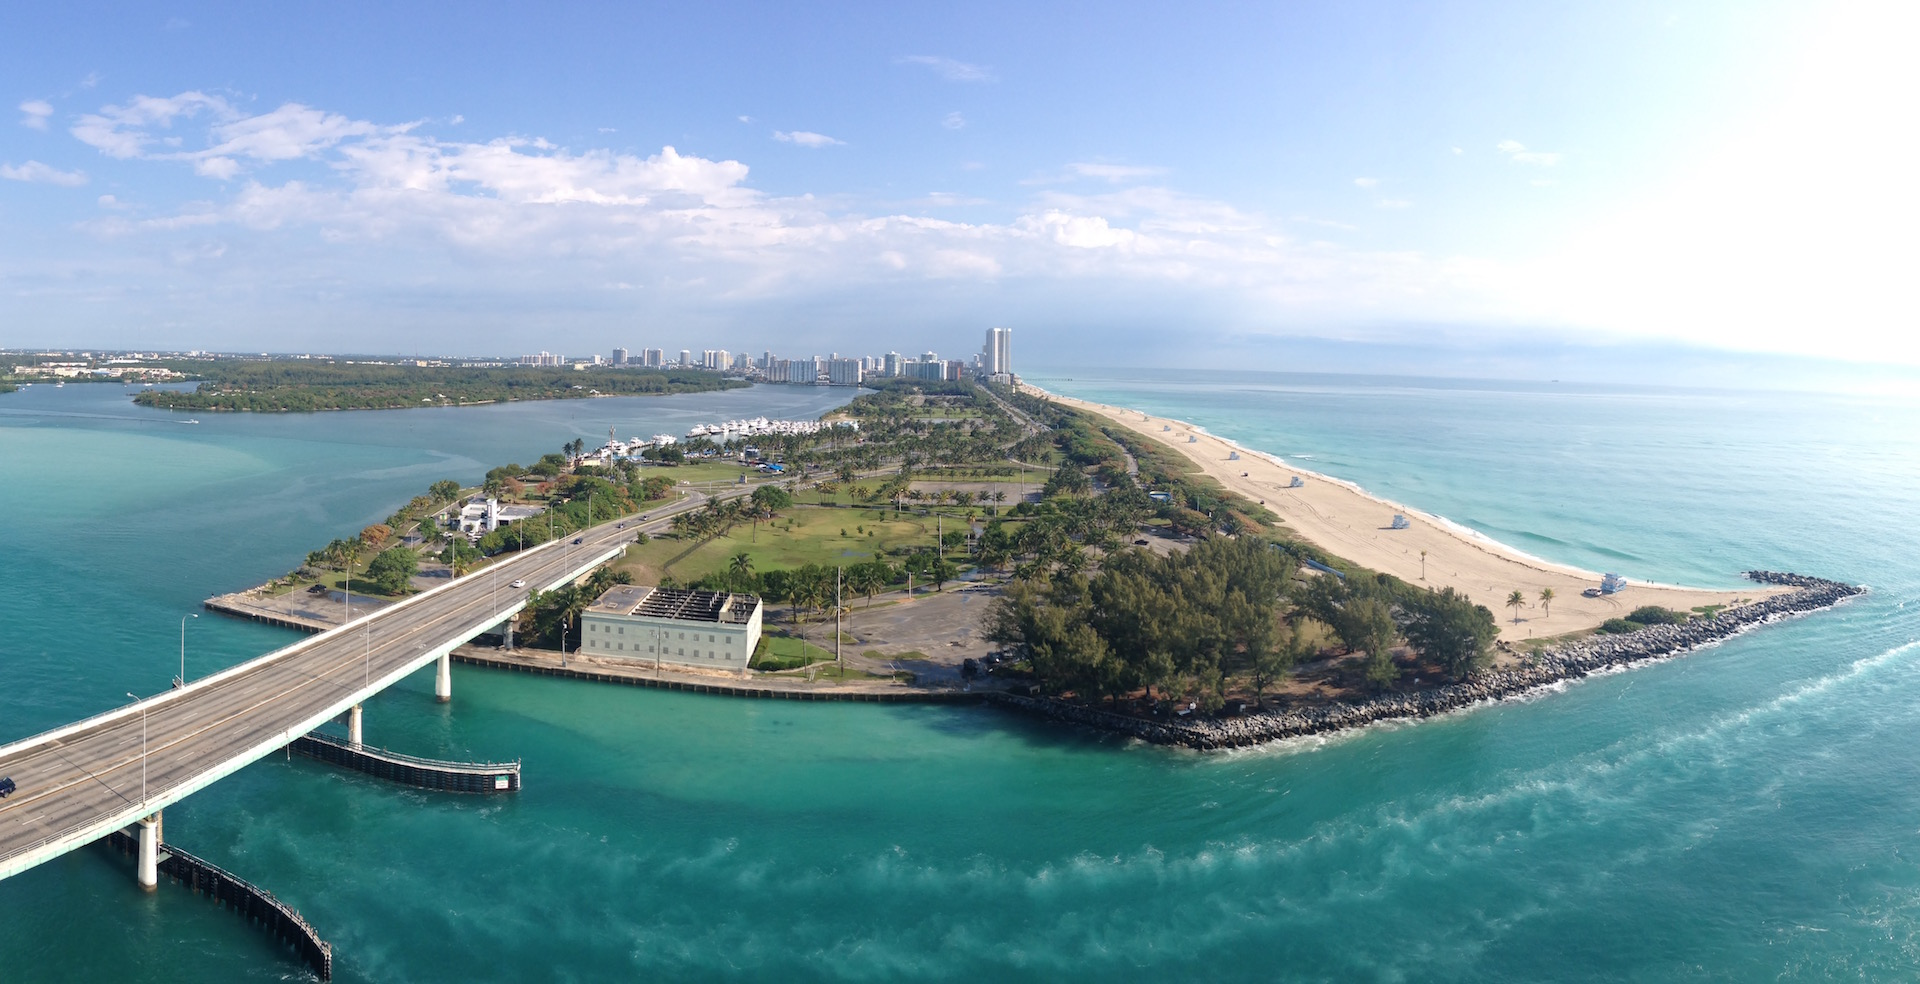 Miami Beach Fishing Charters